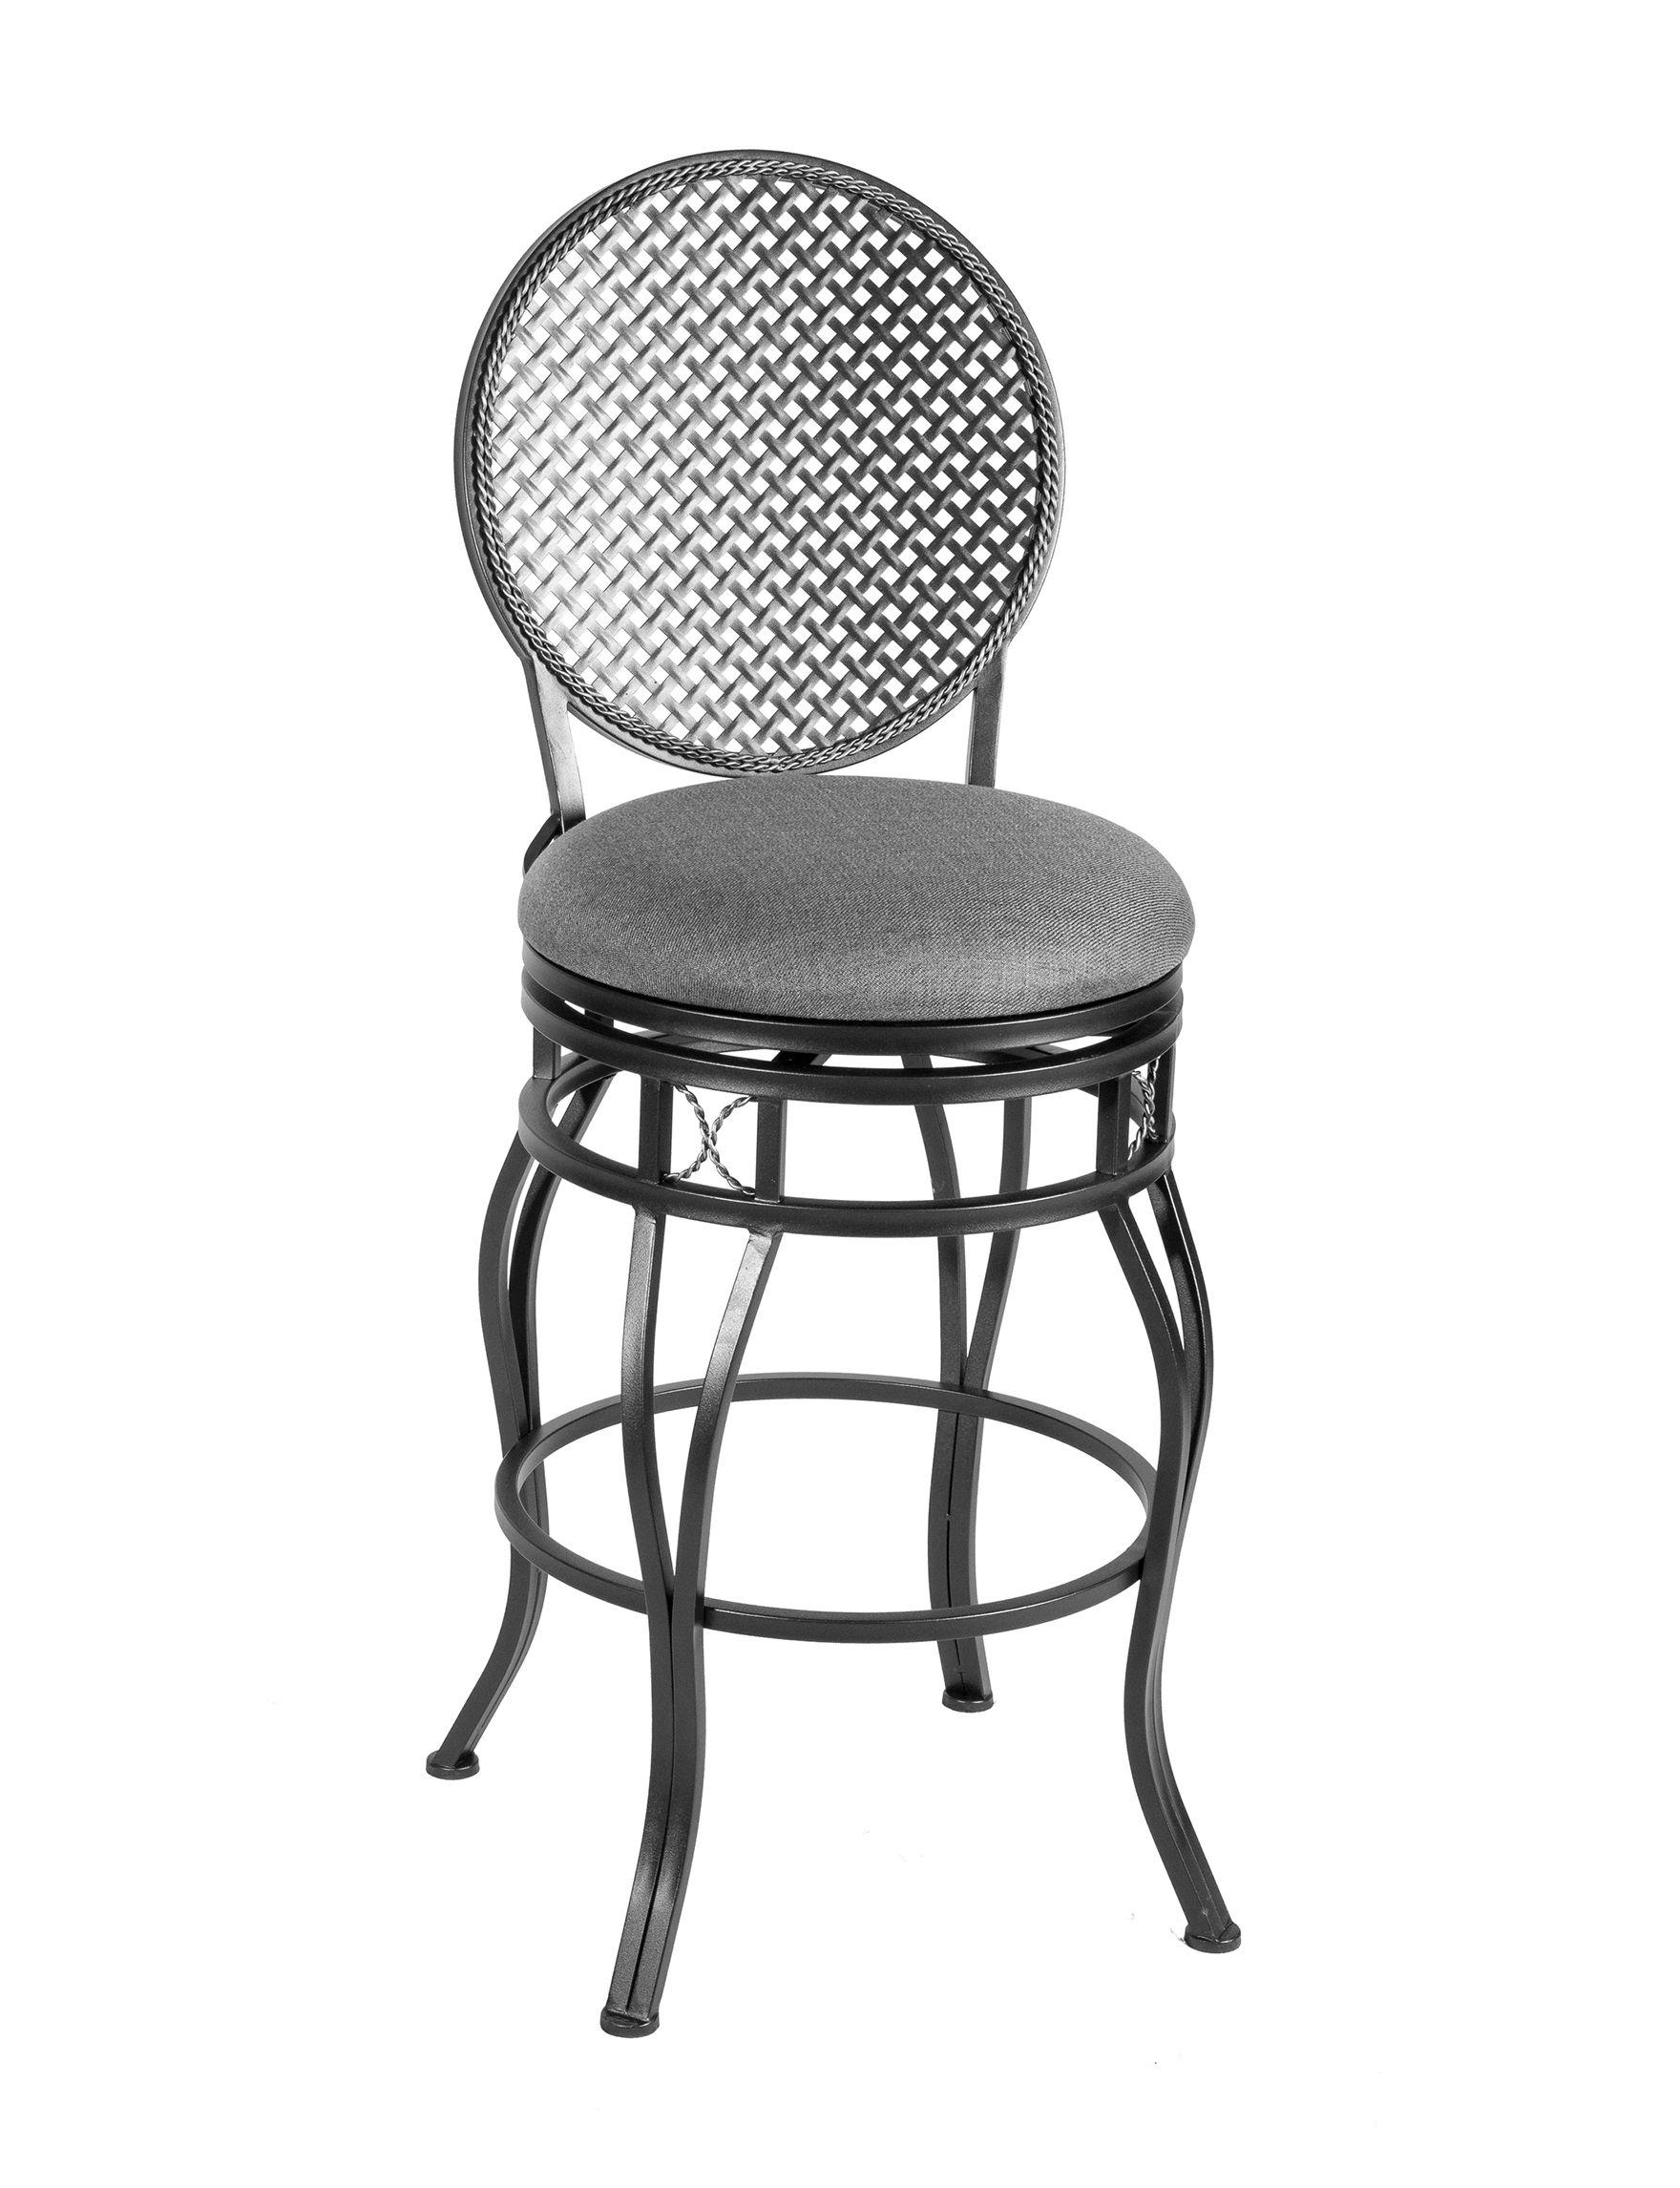 Linon Grey Bar & Kitchen Stools Kitchen & Dining Furniture